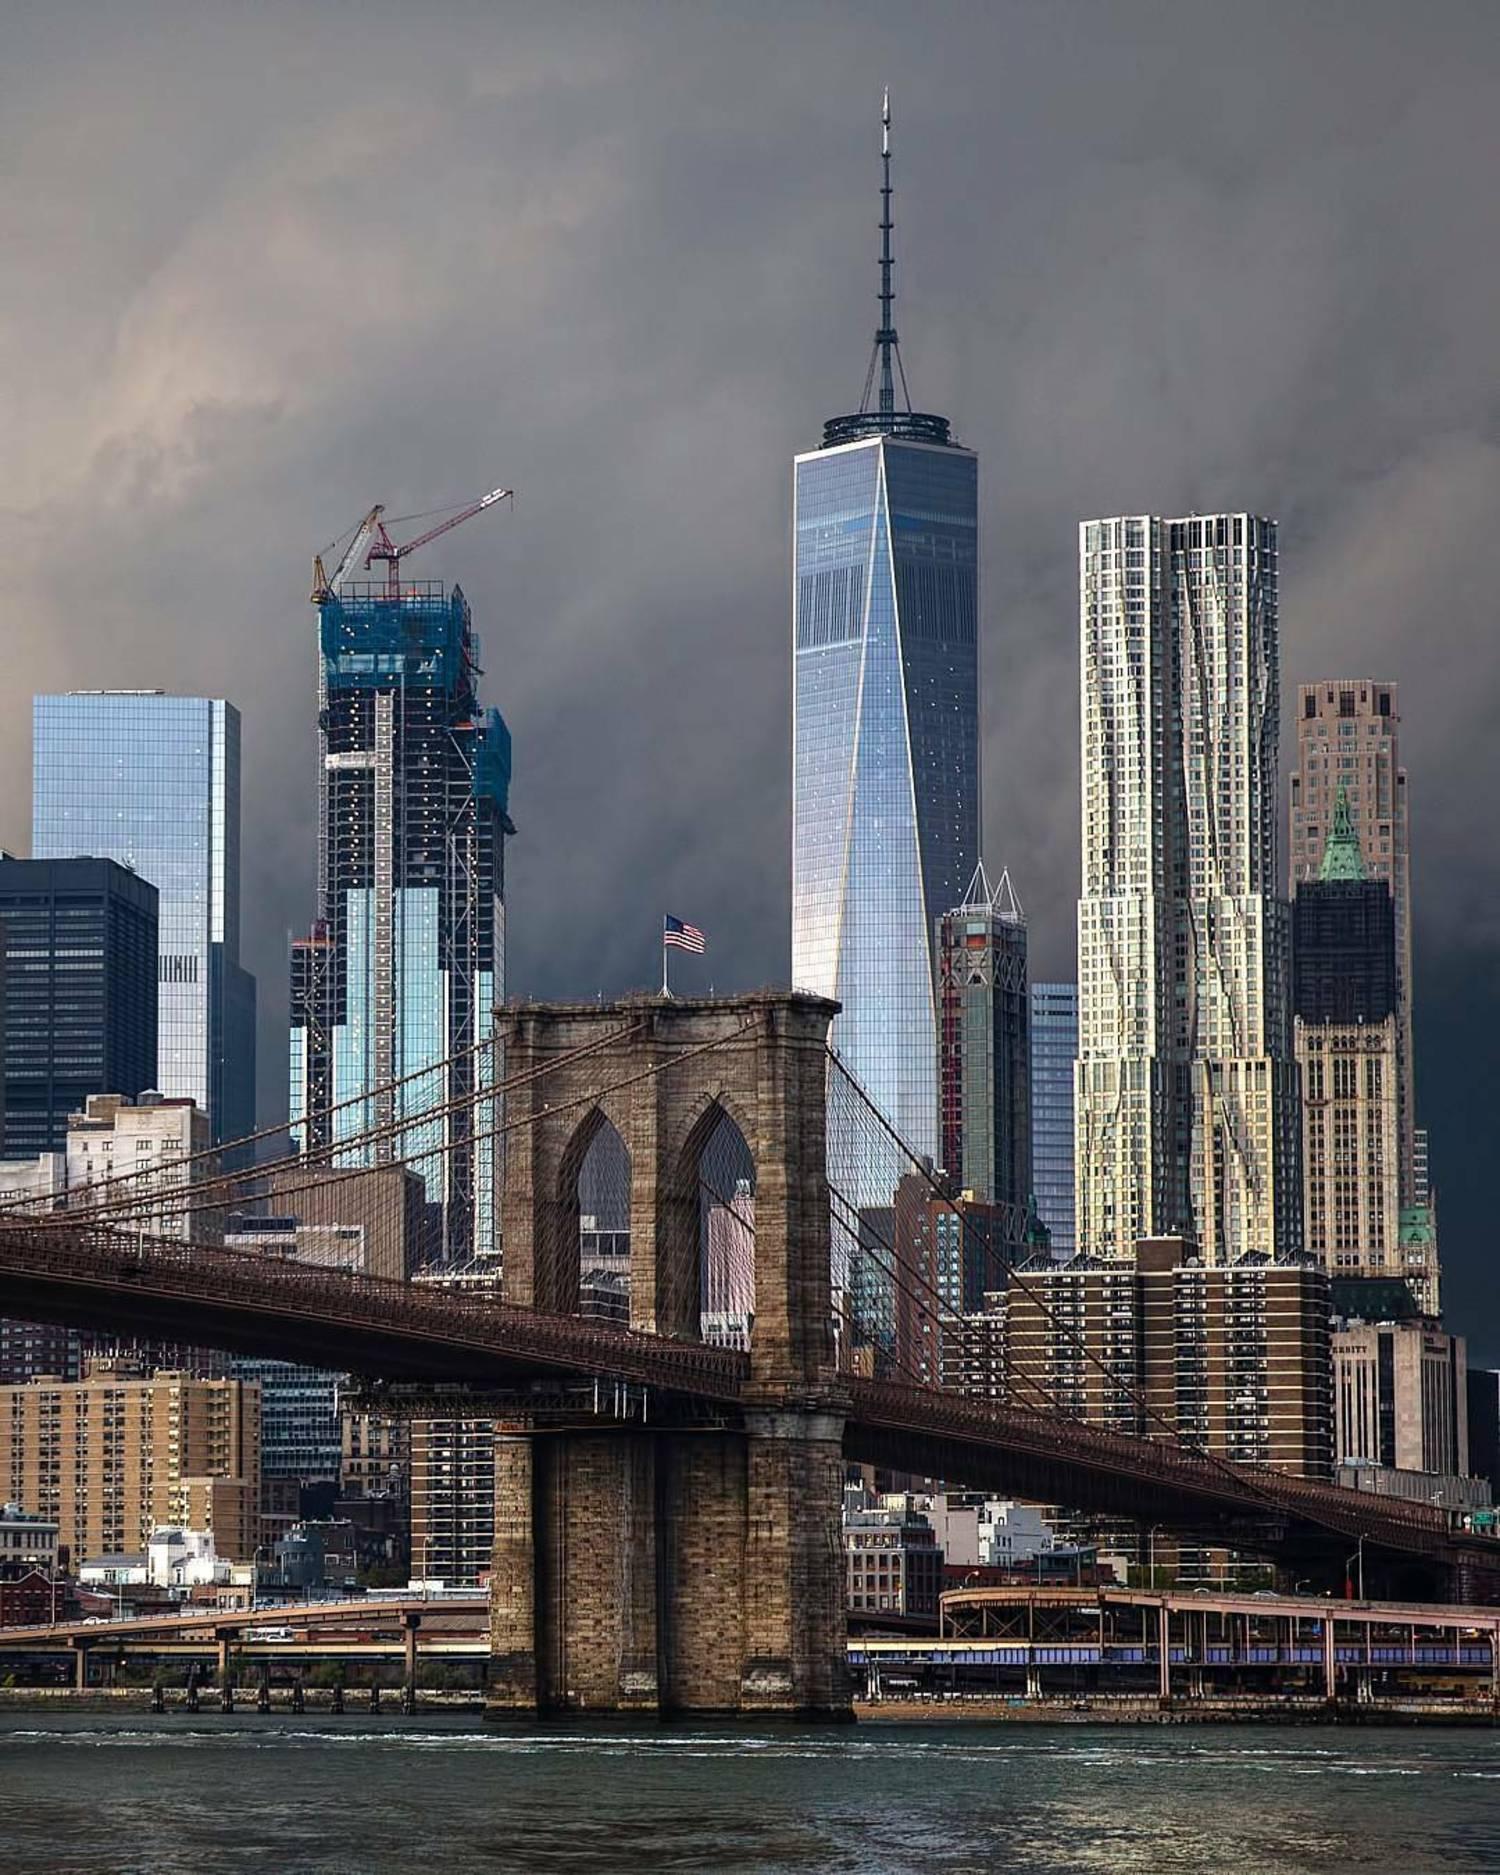 Brooklyn Bridge and Lower Manhattan Skyline, New York, New York